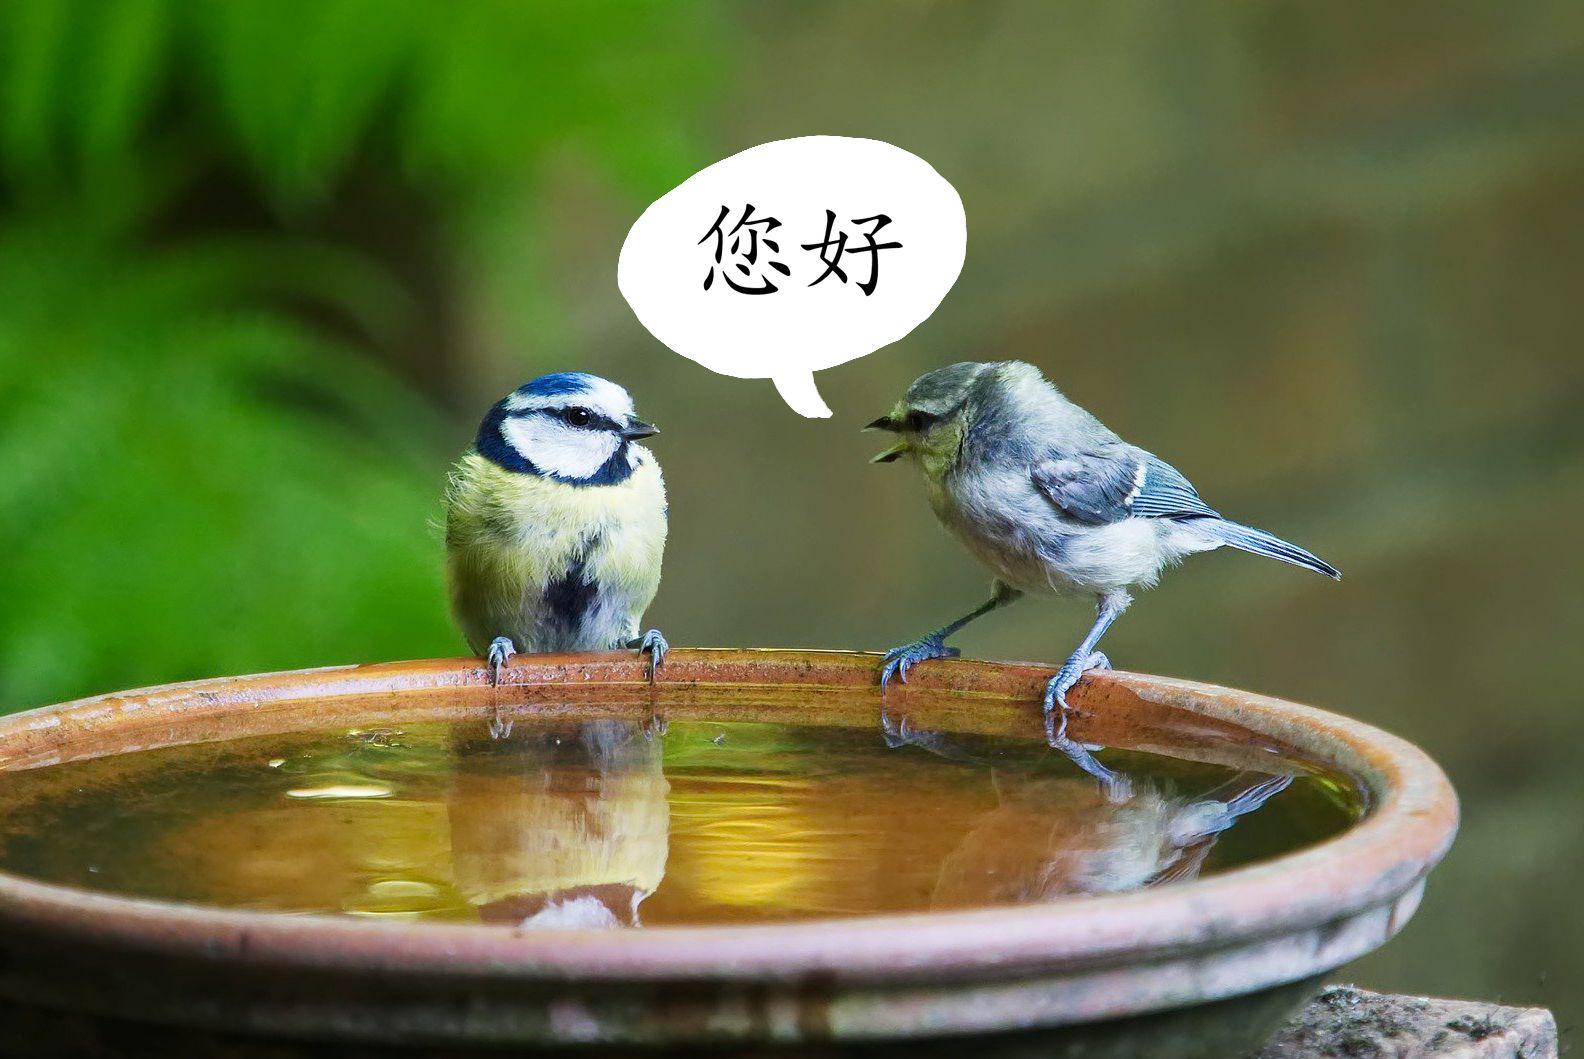 Birds speaking Chinese